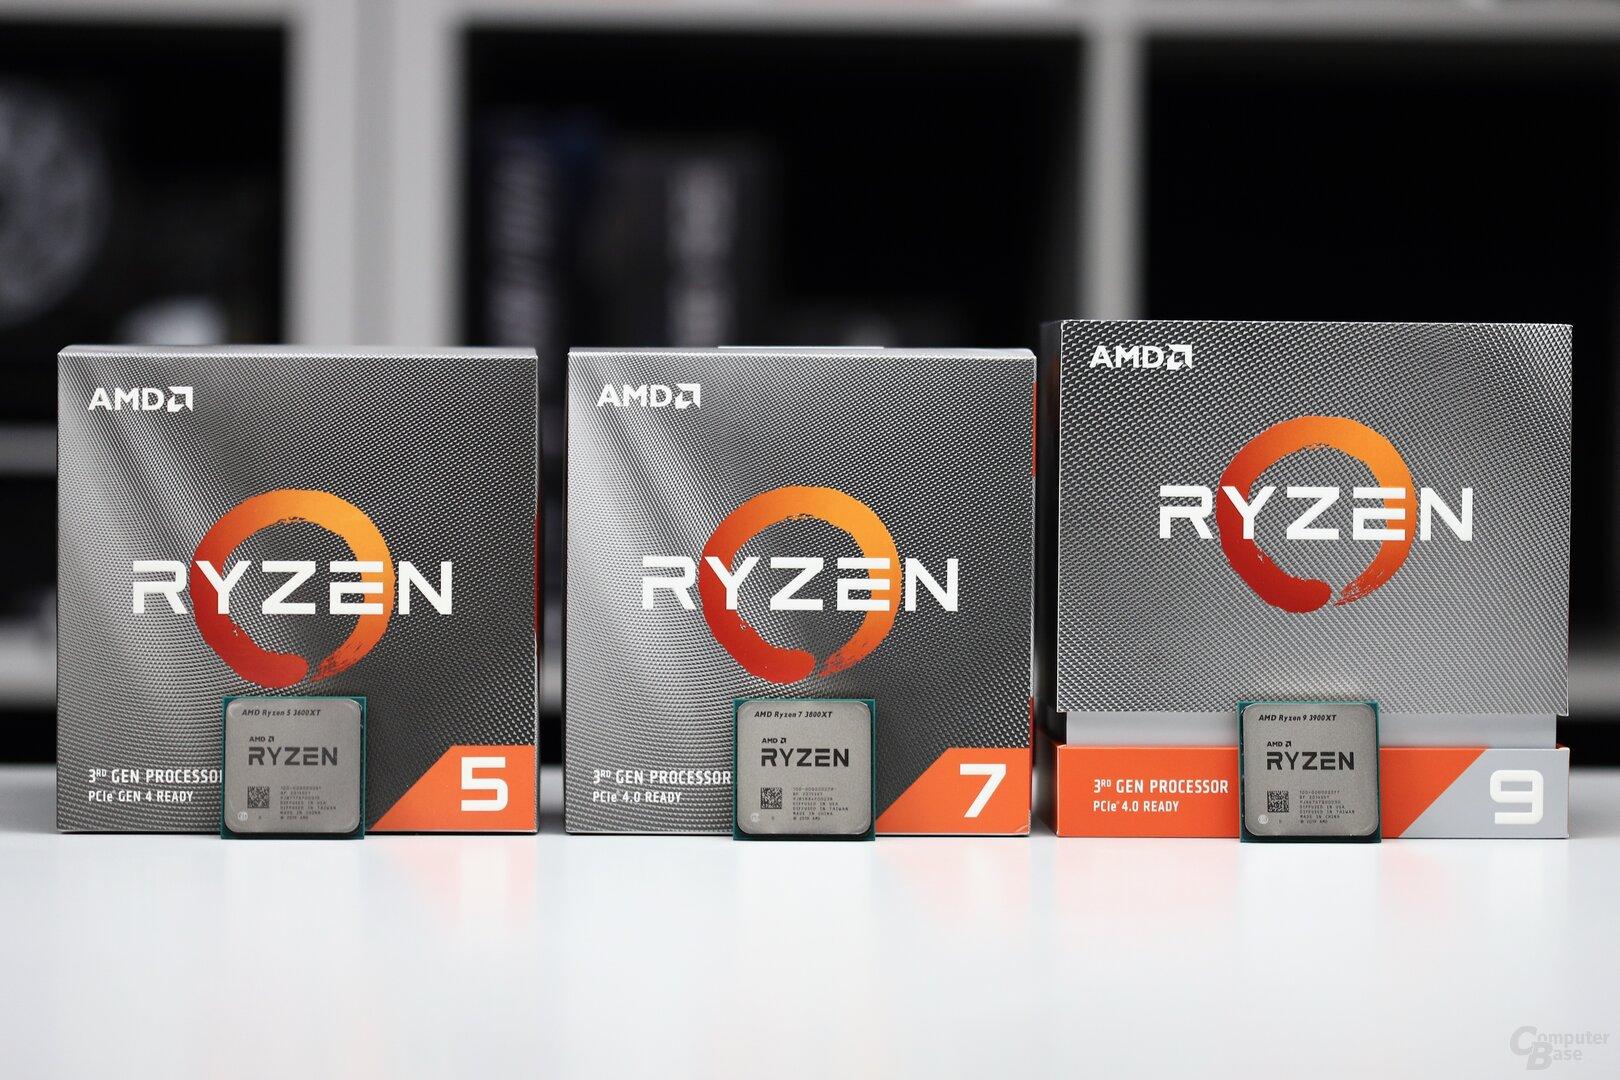 AMD Ryzen 9 3900XT, 7 3800XT und 5 3600XT im Test